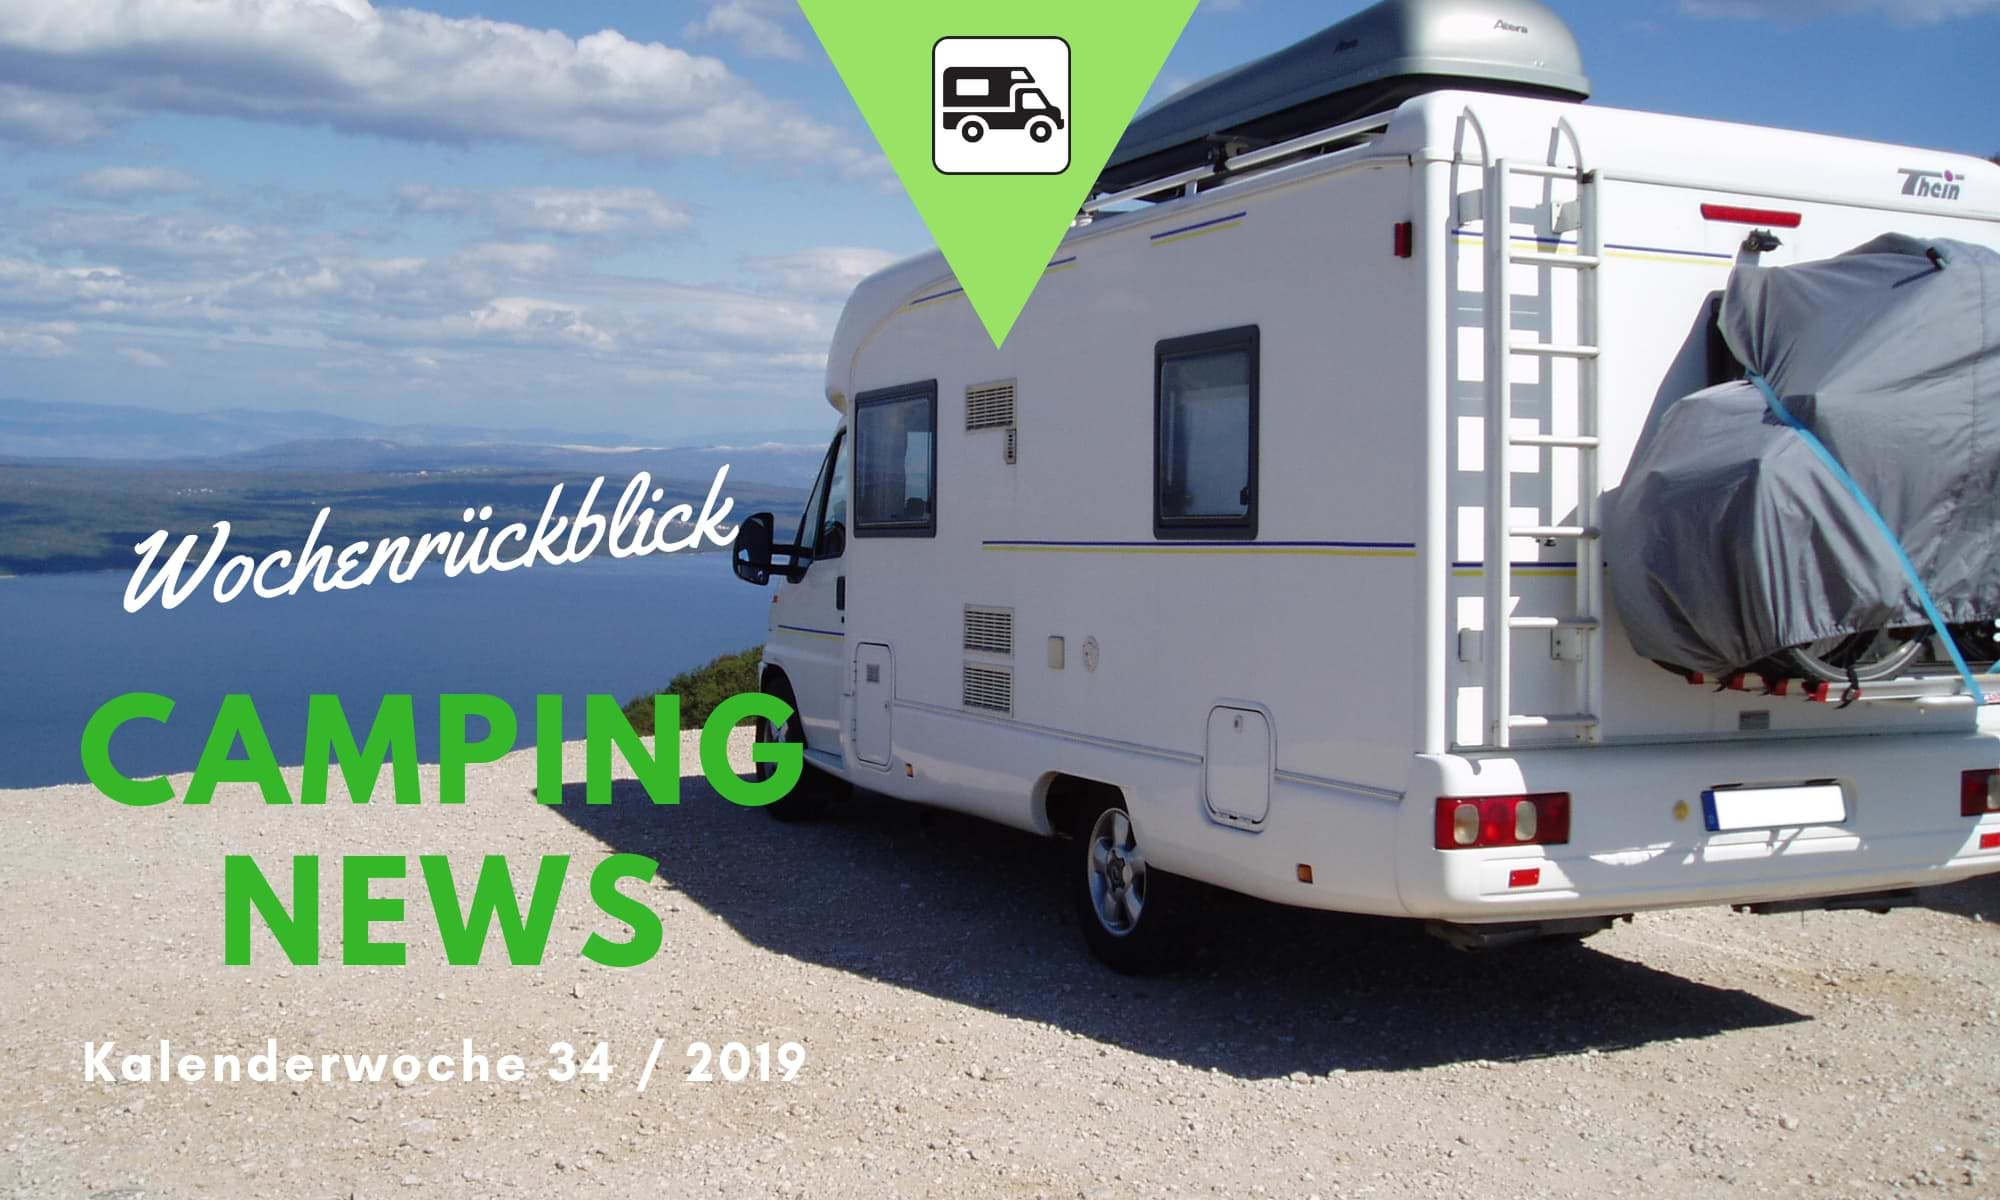 Wochenrückblick Camping News KW34-2019